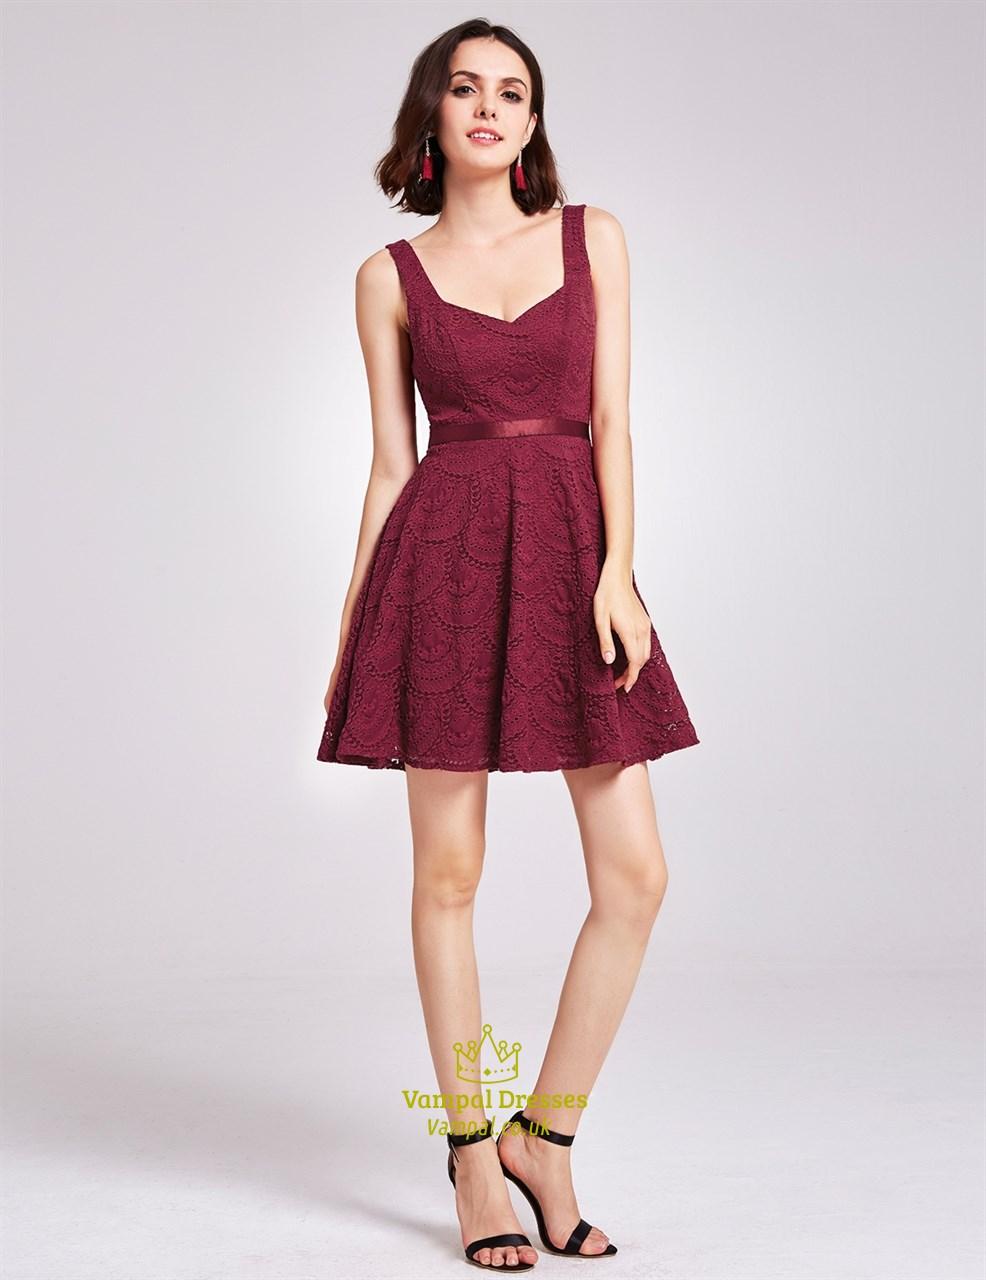 6ec9b89ed4d Charming A Line Burgundy Lace Sleeveless Short V Neck Homecoming Dress SKU  -FS2936